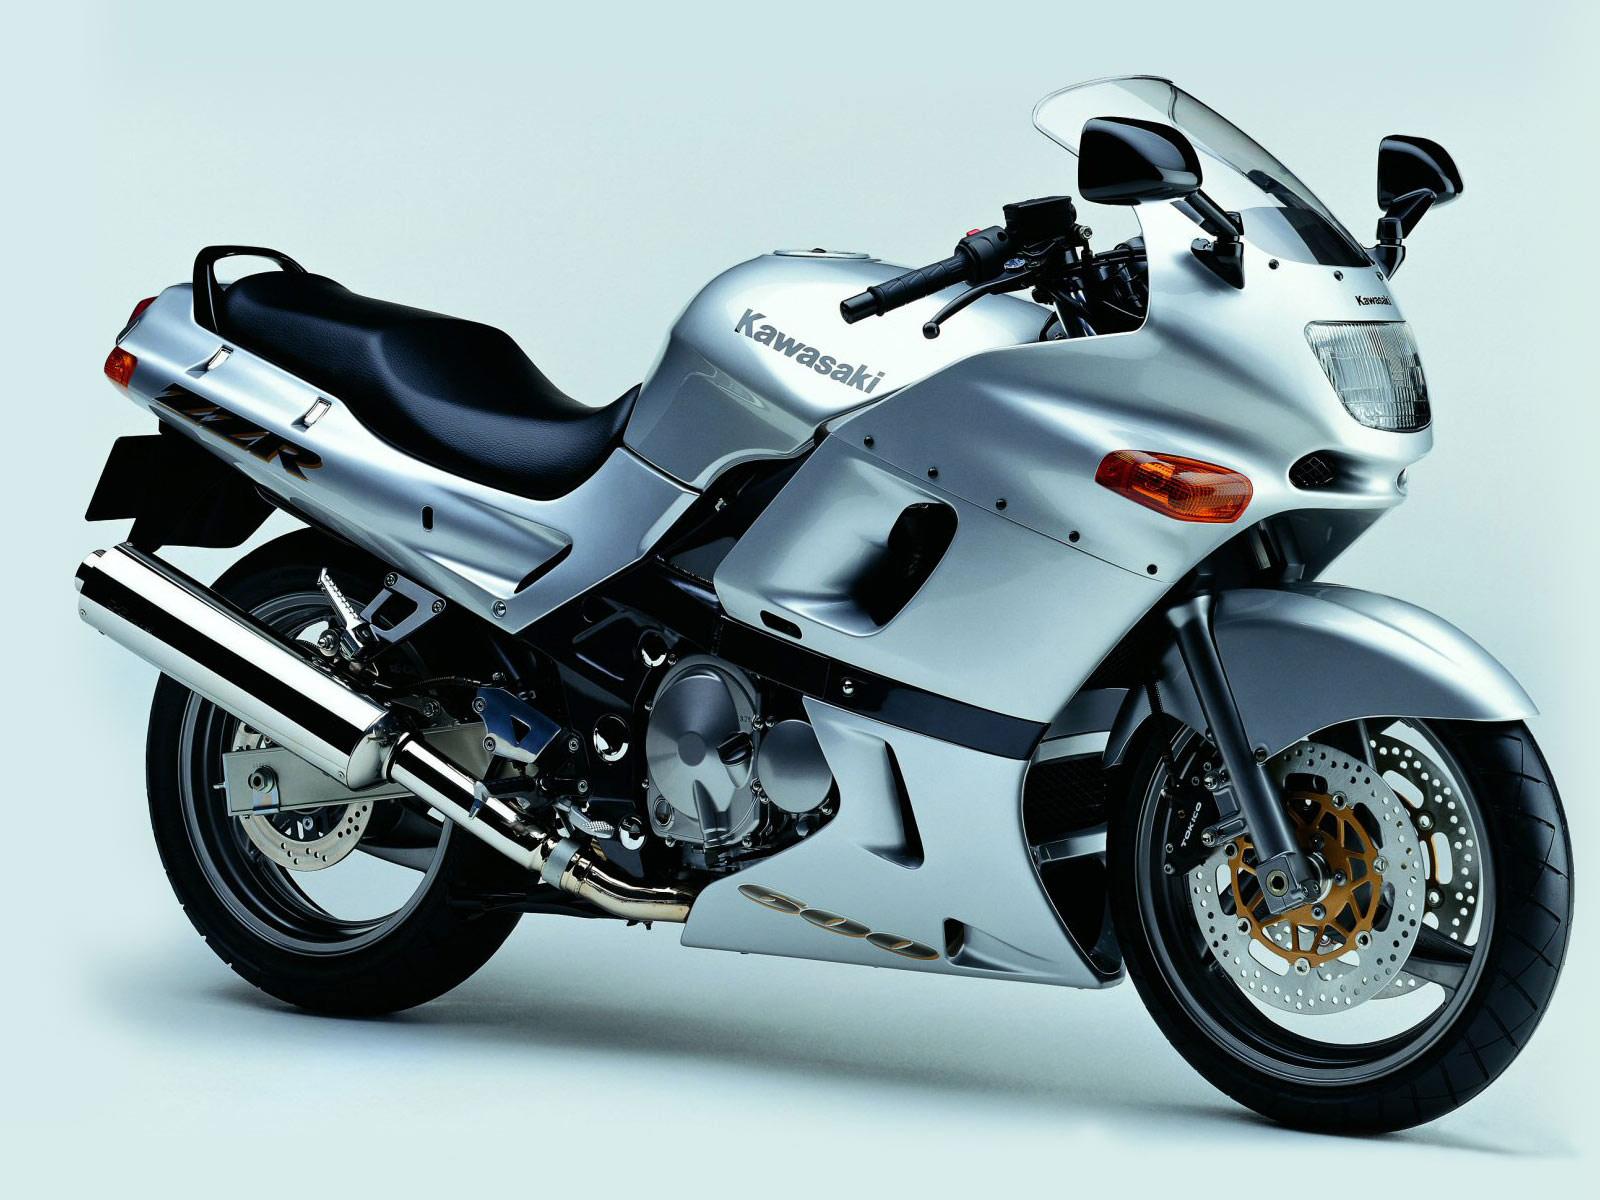 Surprising 2004 Kawasaki Zzr 600 Motorcycle Wallpaper Accident Lawyers Uwap Interior Chair Design Uwaporg